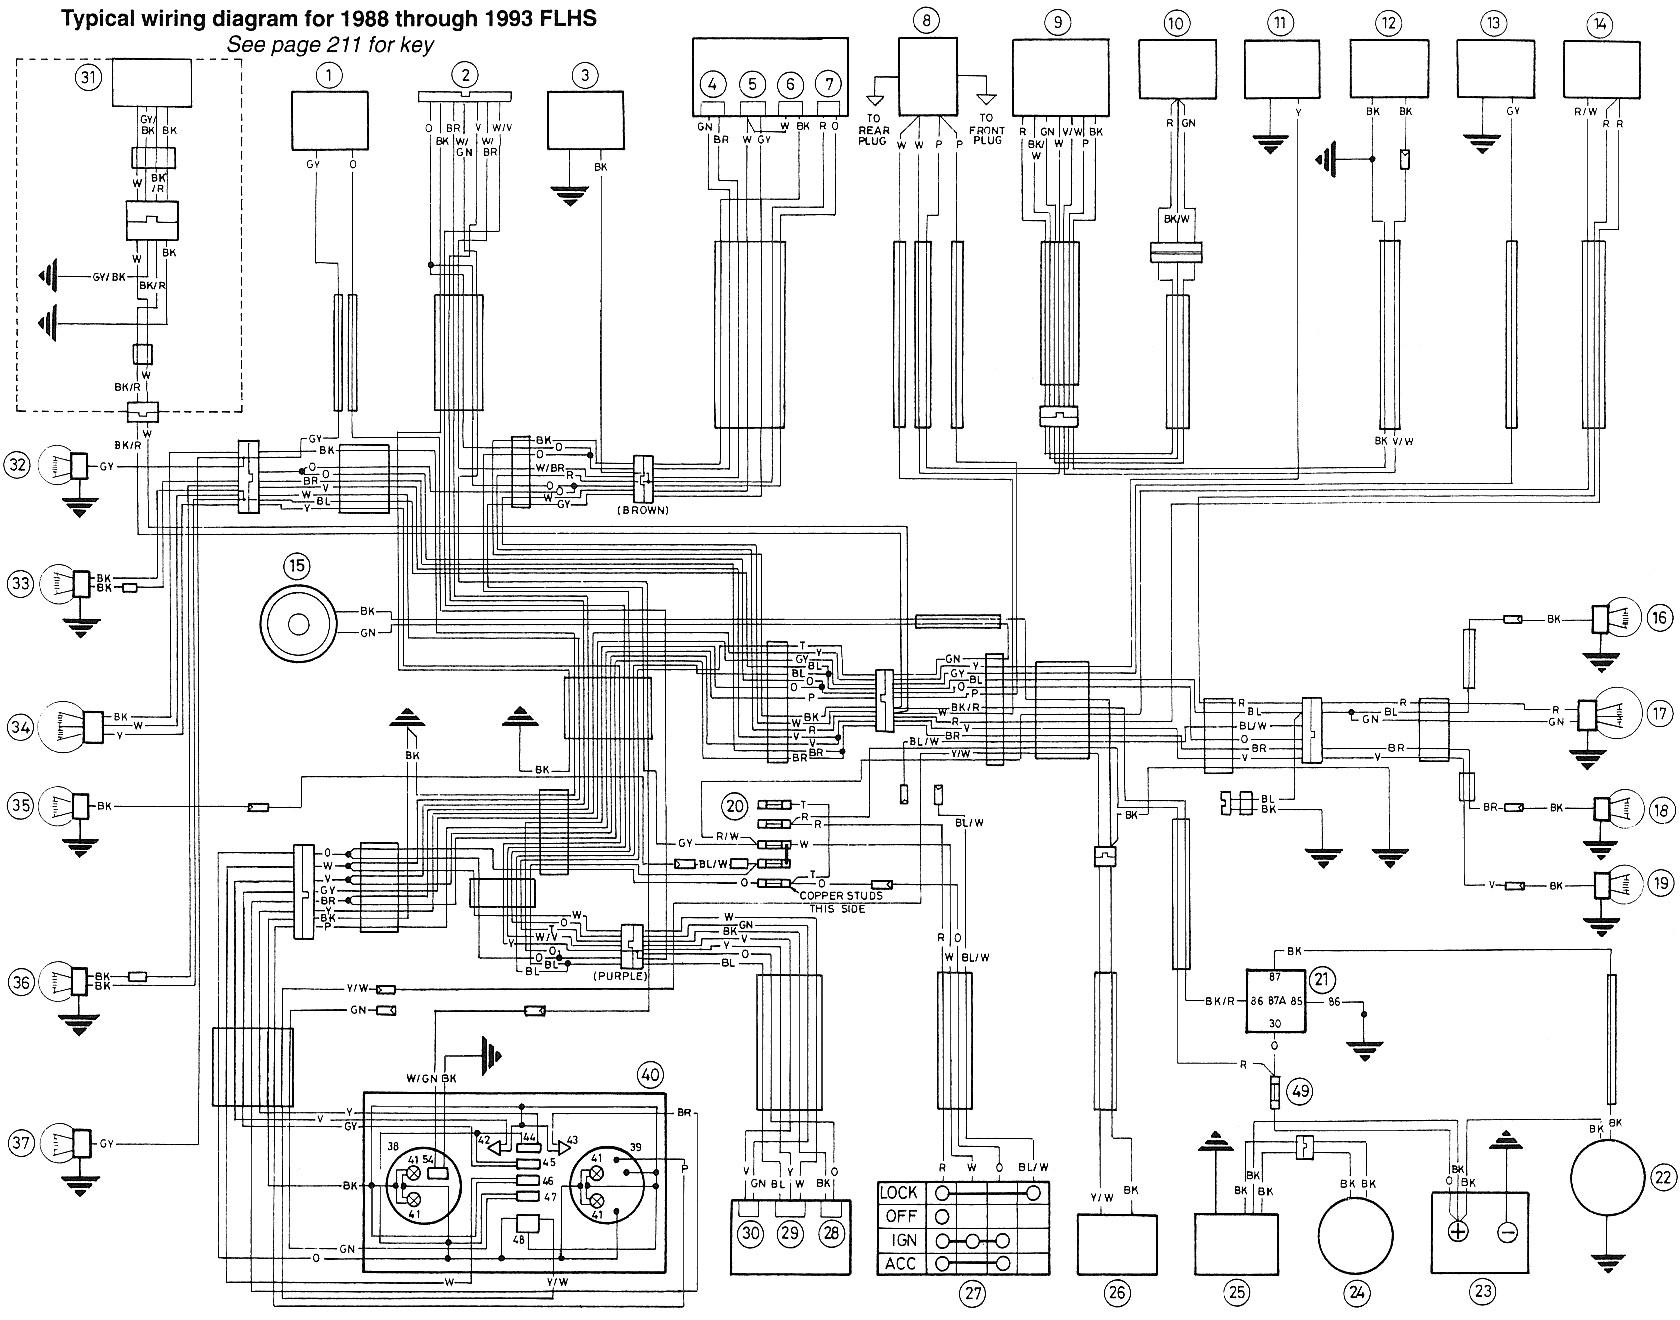 98 Flstc Harley Davidson Motorcycle Diagrams | Wiring Diagram on